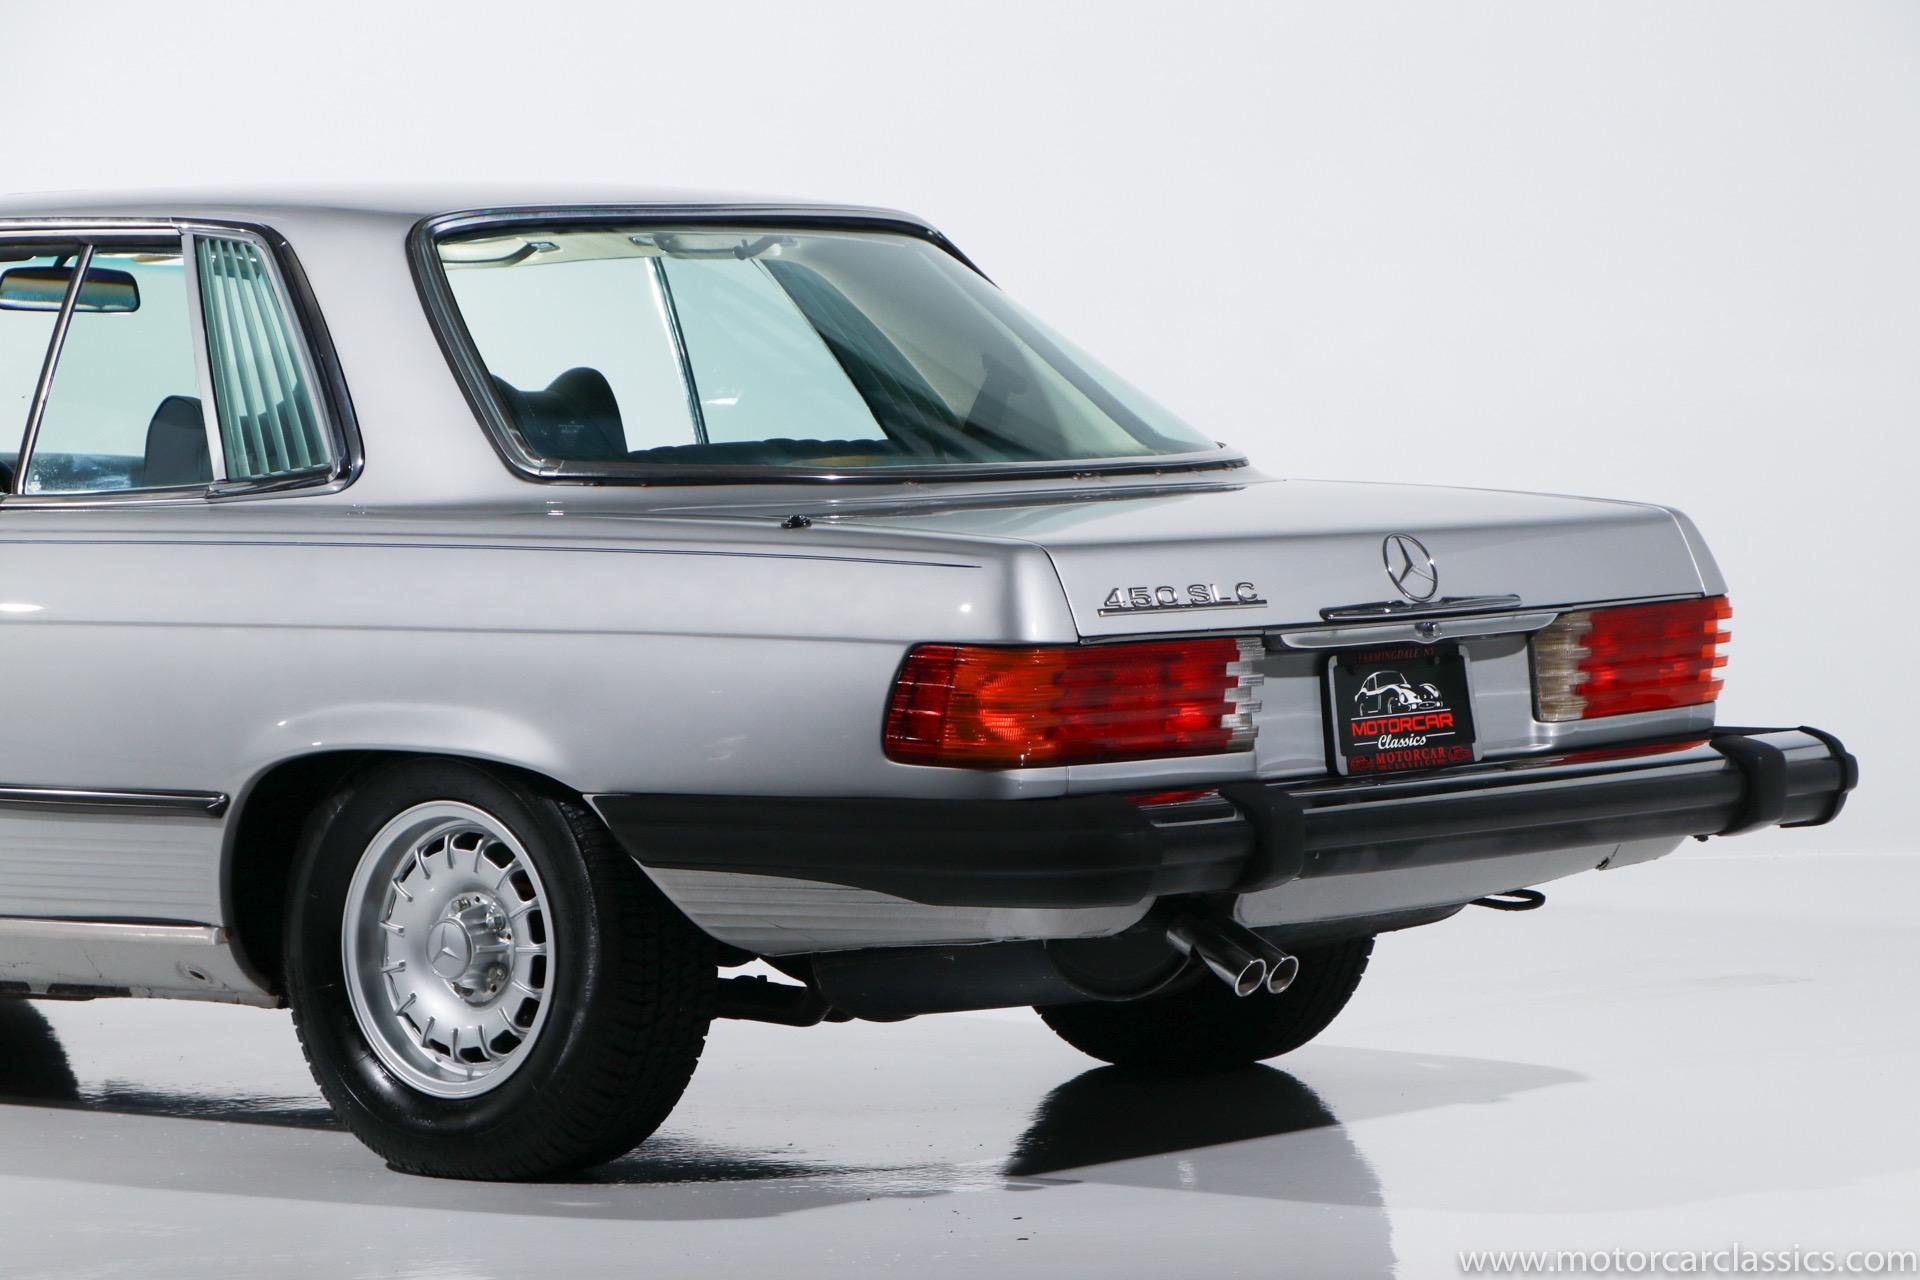 1975 Mercedes-Benz 450SLC